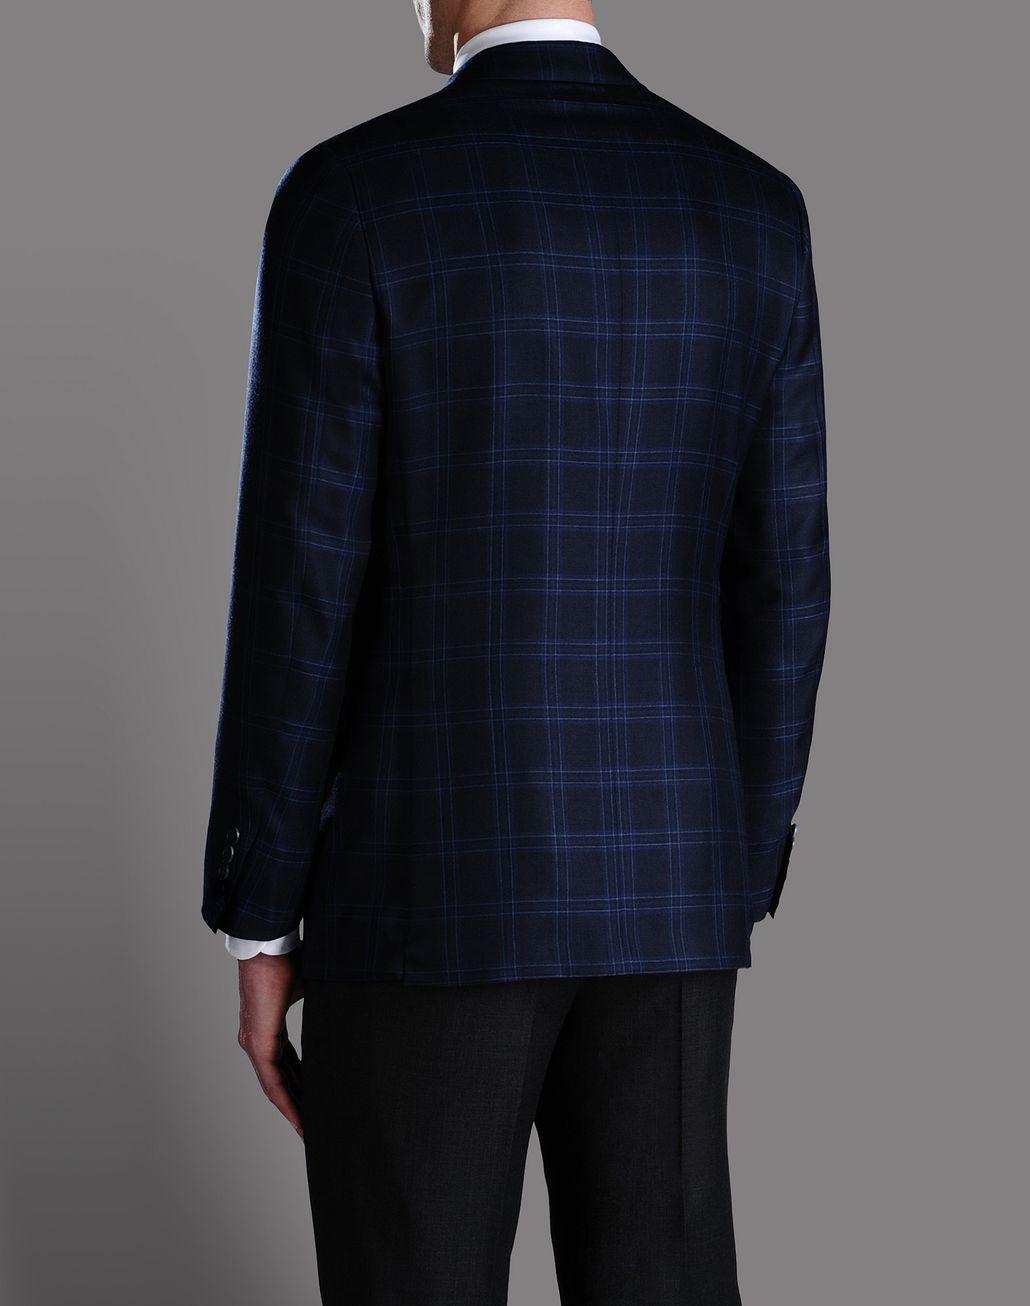 BRIONI JACKET  Suits & Jackets U r